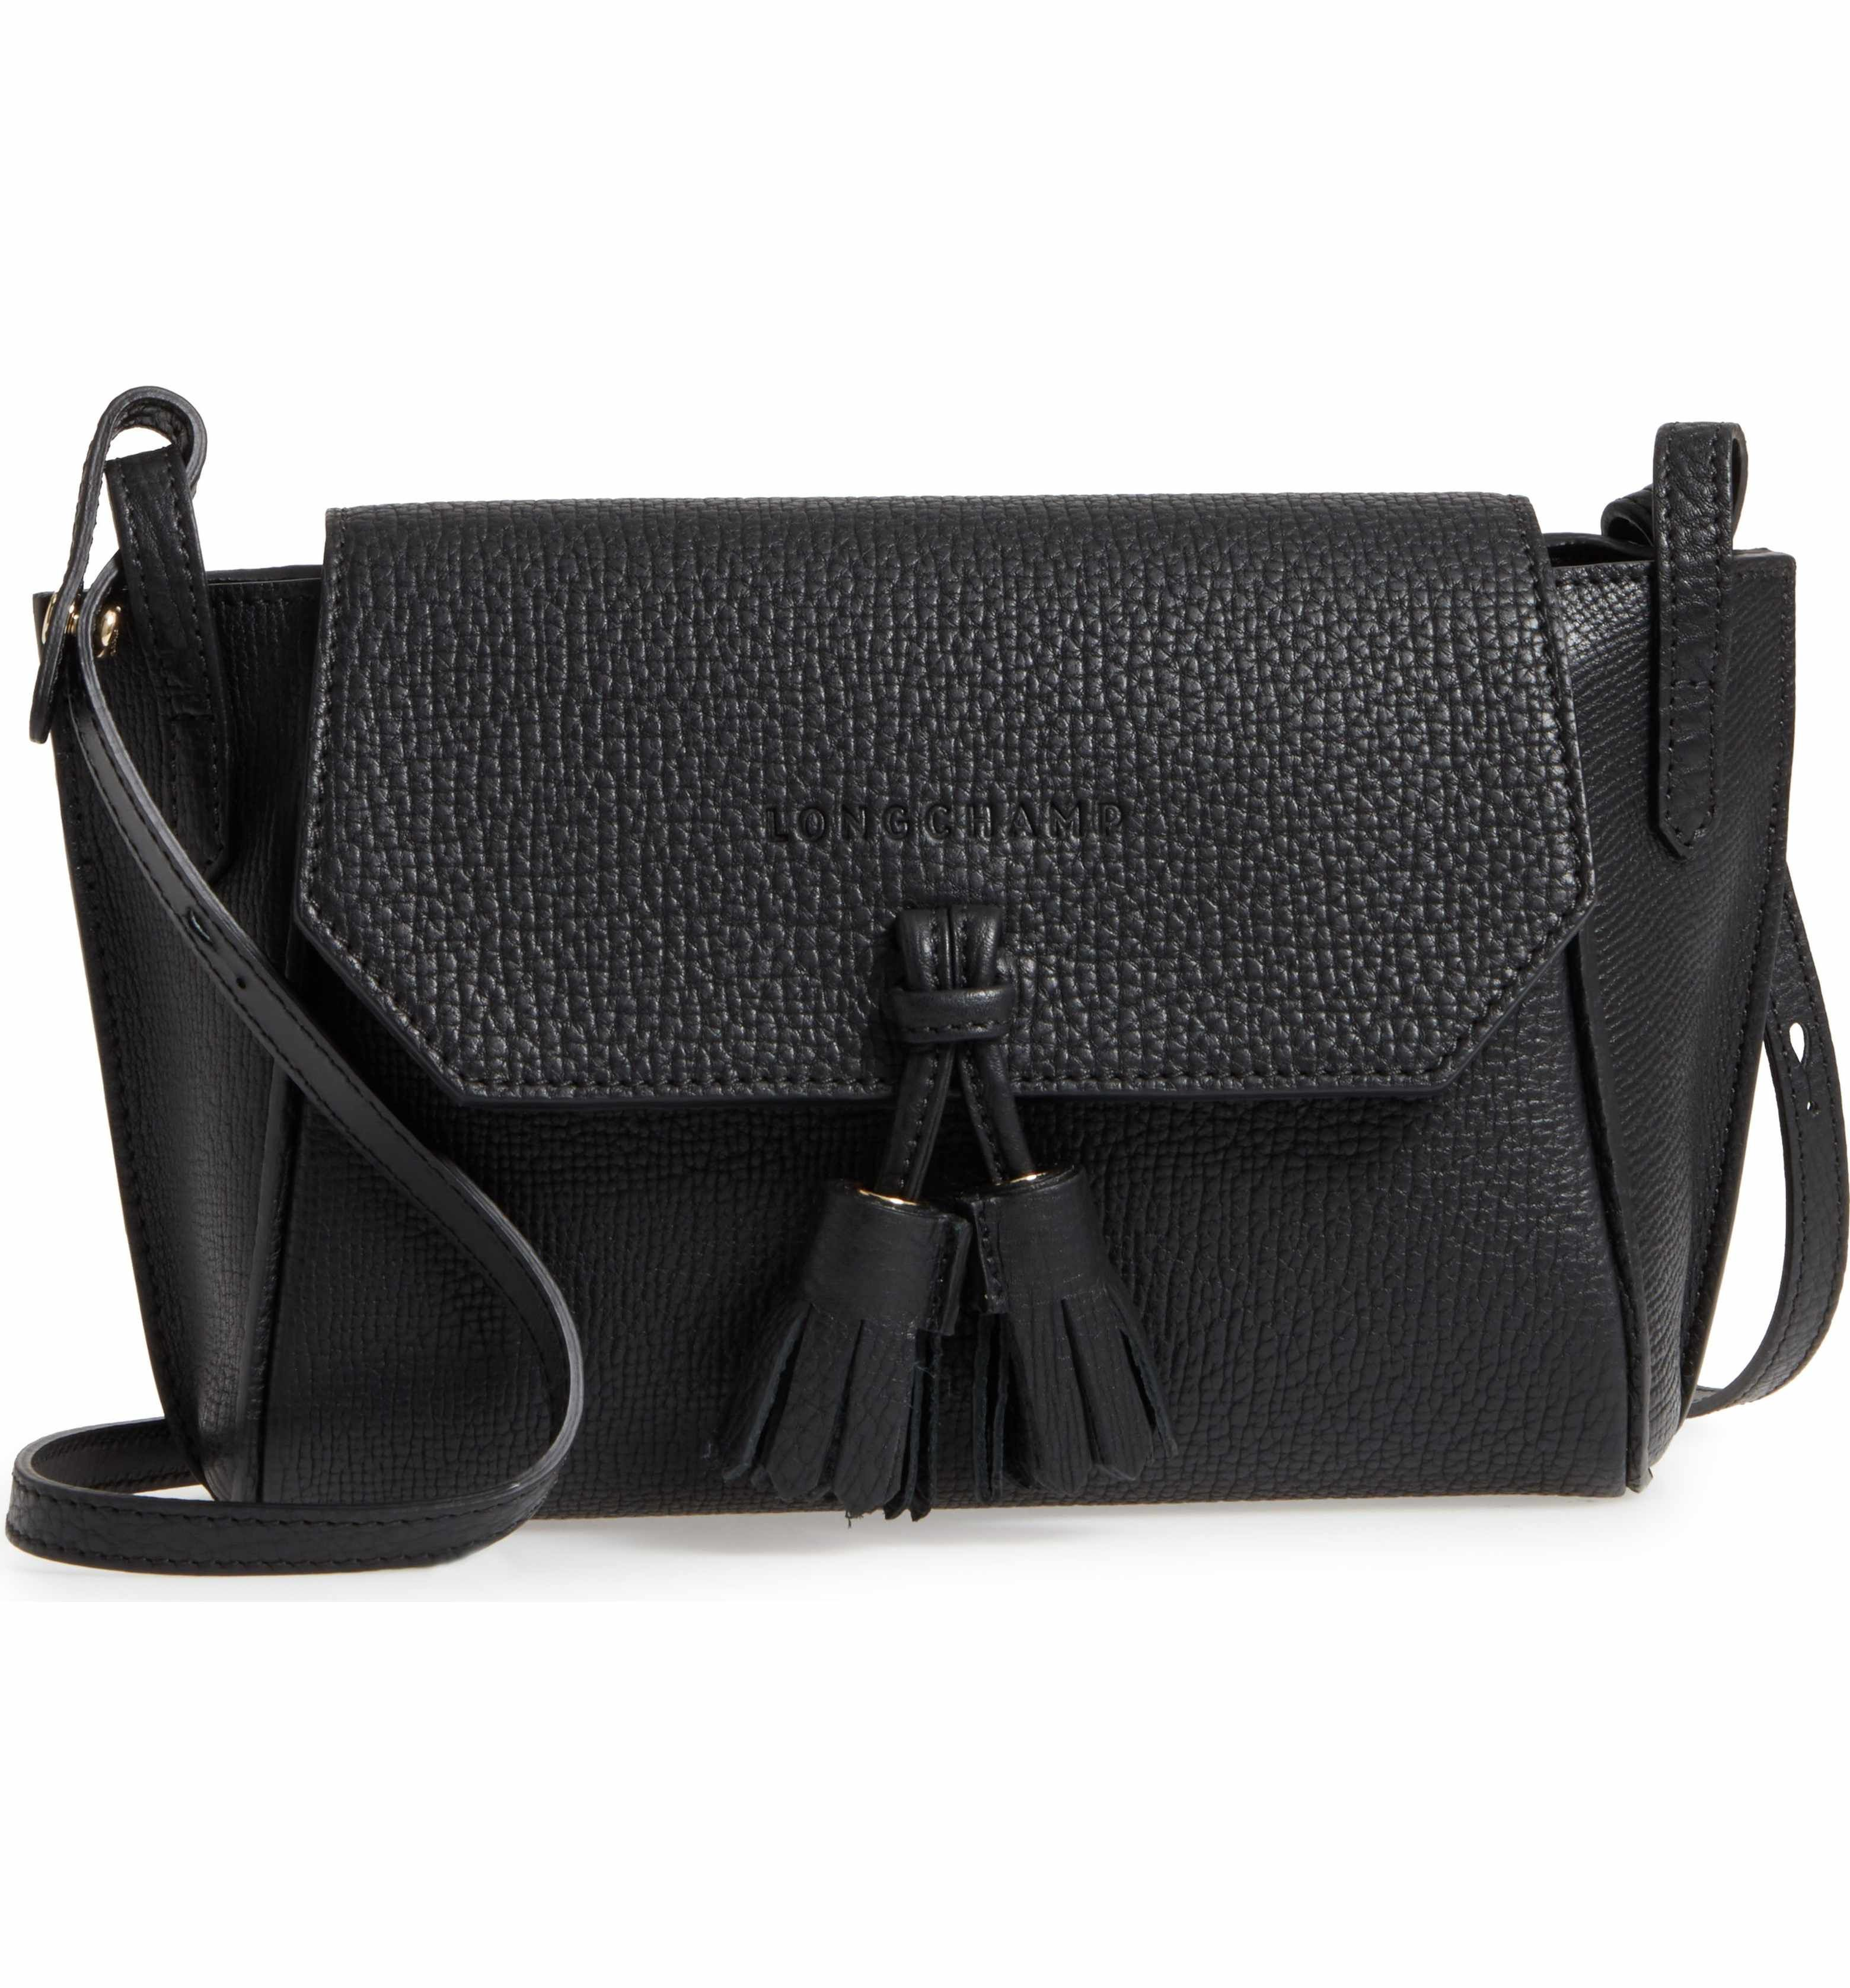 Main Image - Longchamp Penelope Leather Crossbody Bag  87cab38b3d2d8